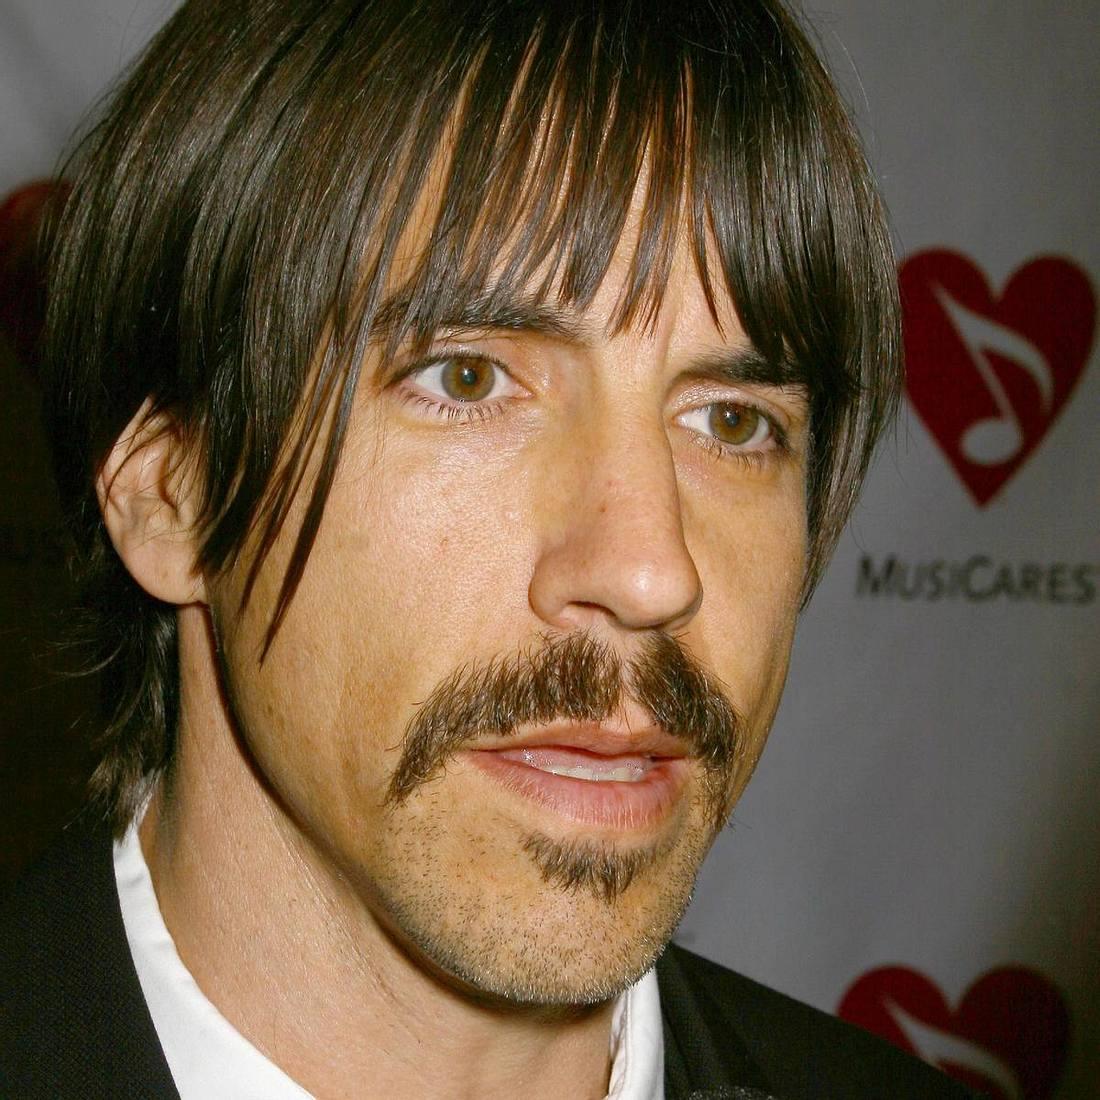 Anthony Kiedis Vergangenheit hindert ihn an neuer Liebe